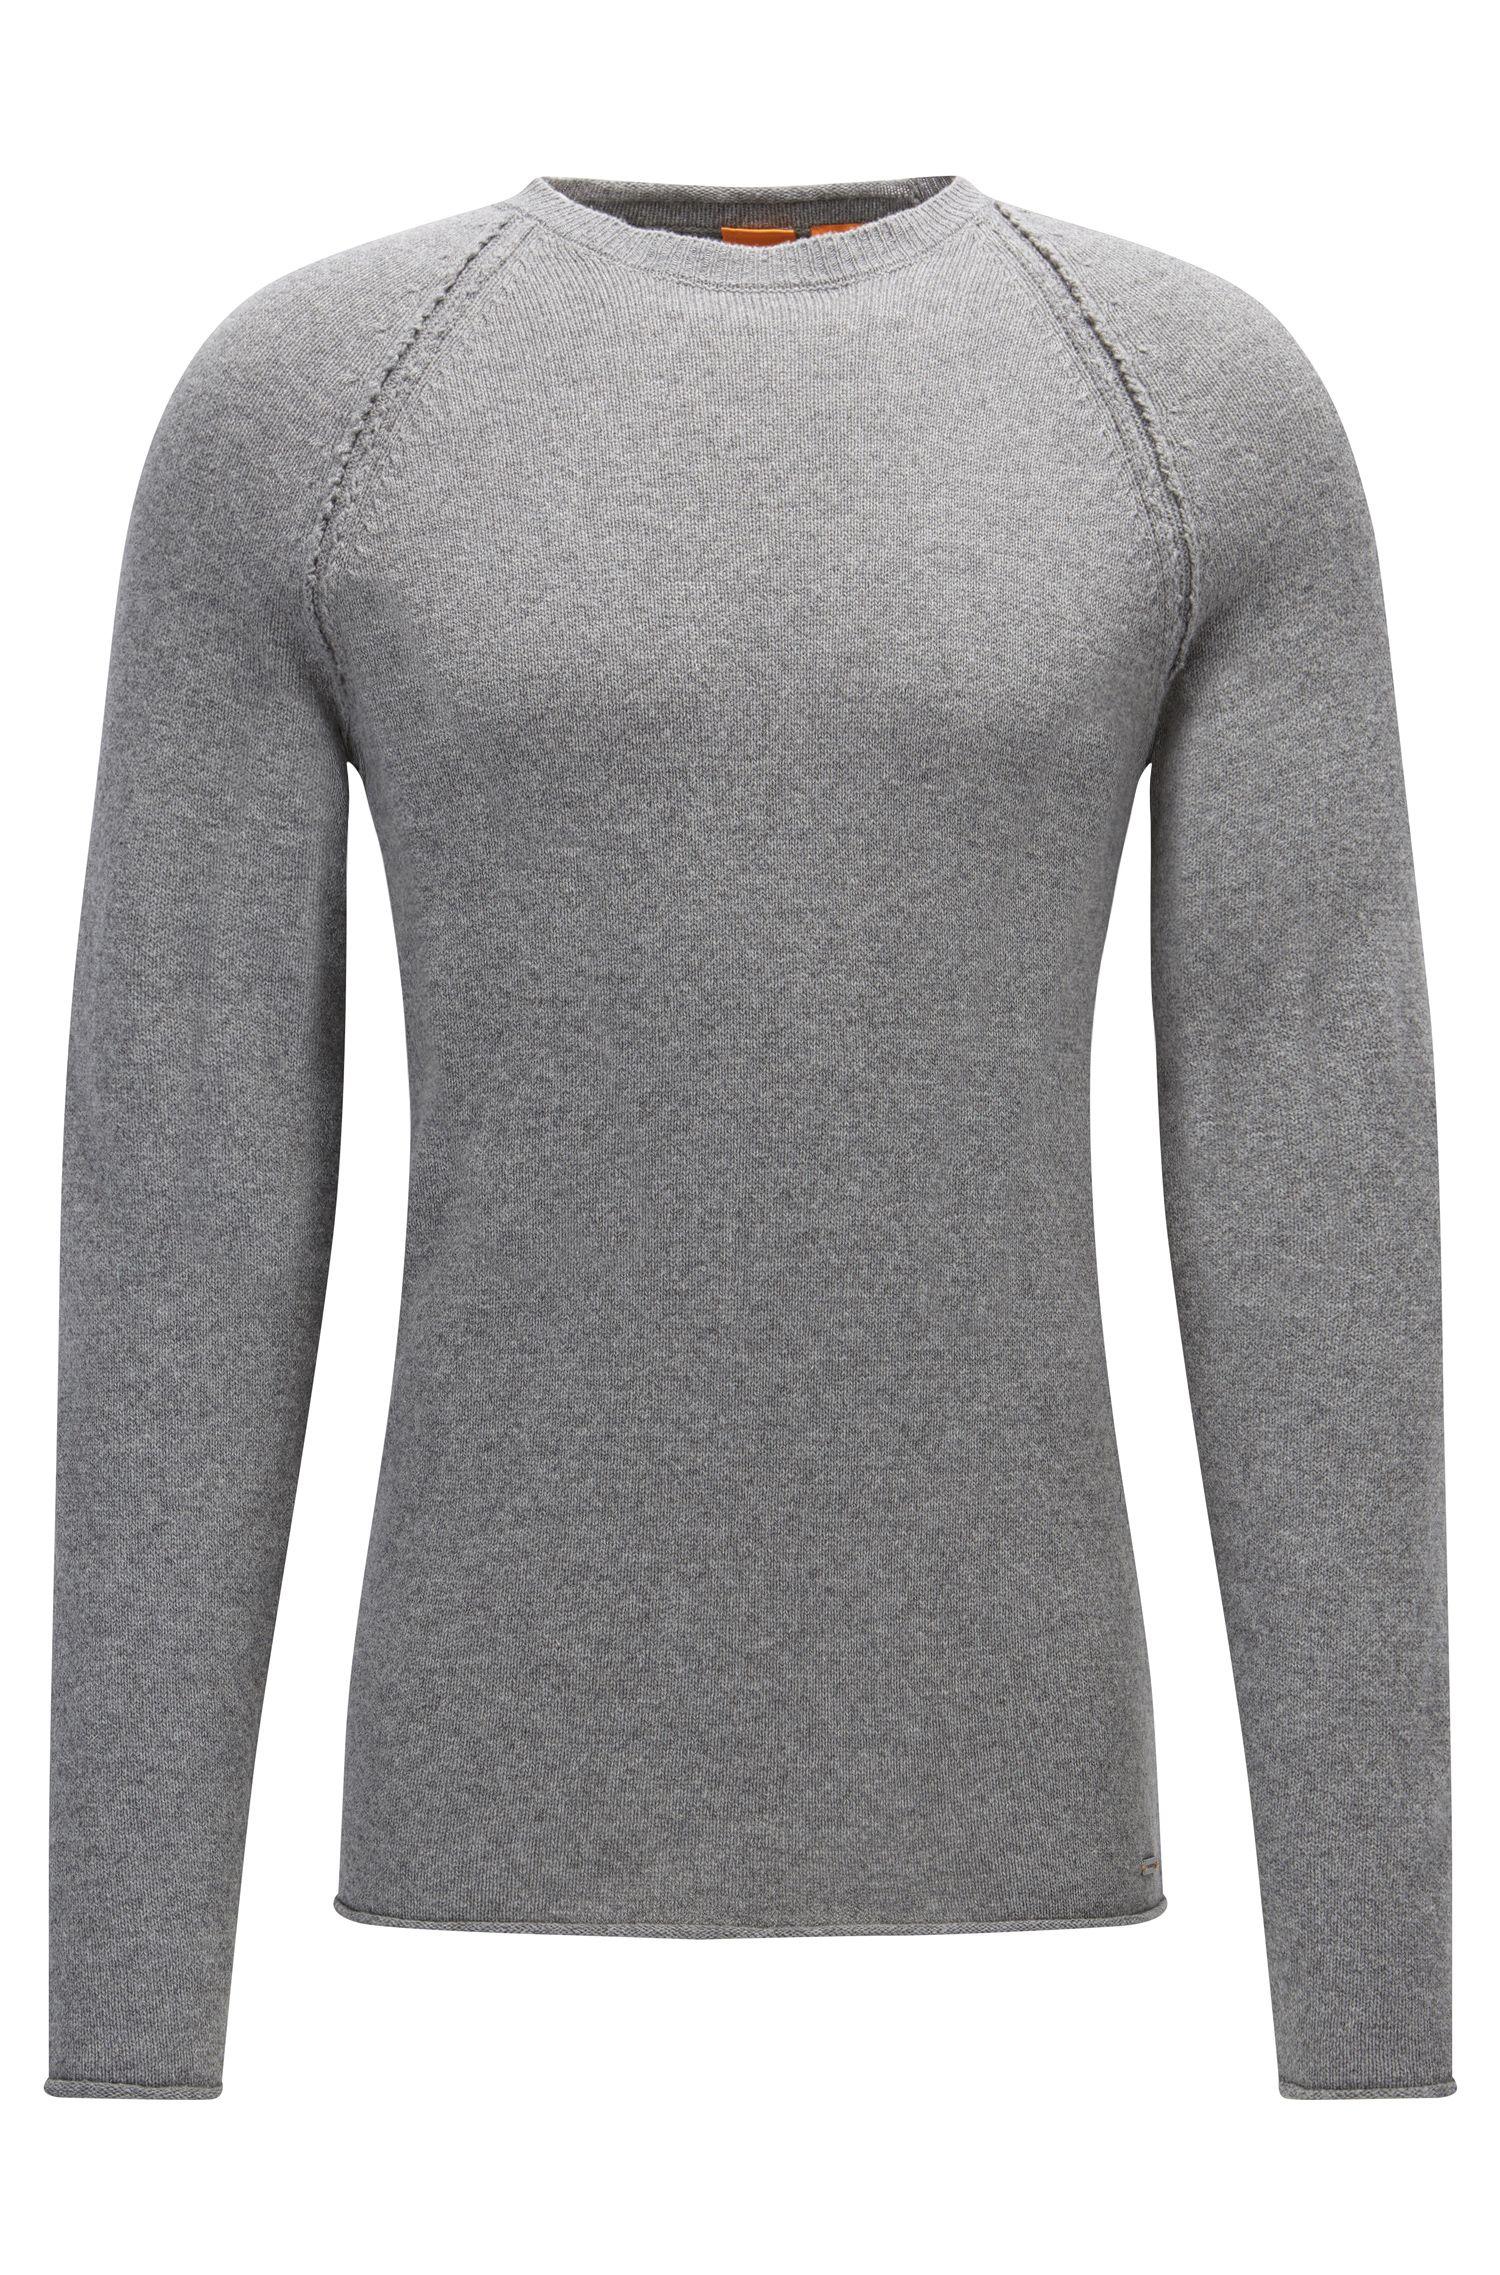 Crew-neck sweater in Italian fabric